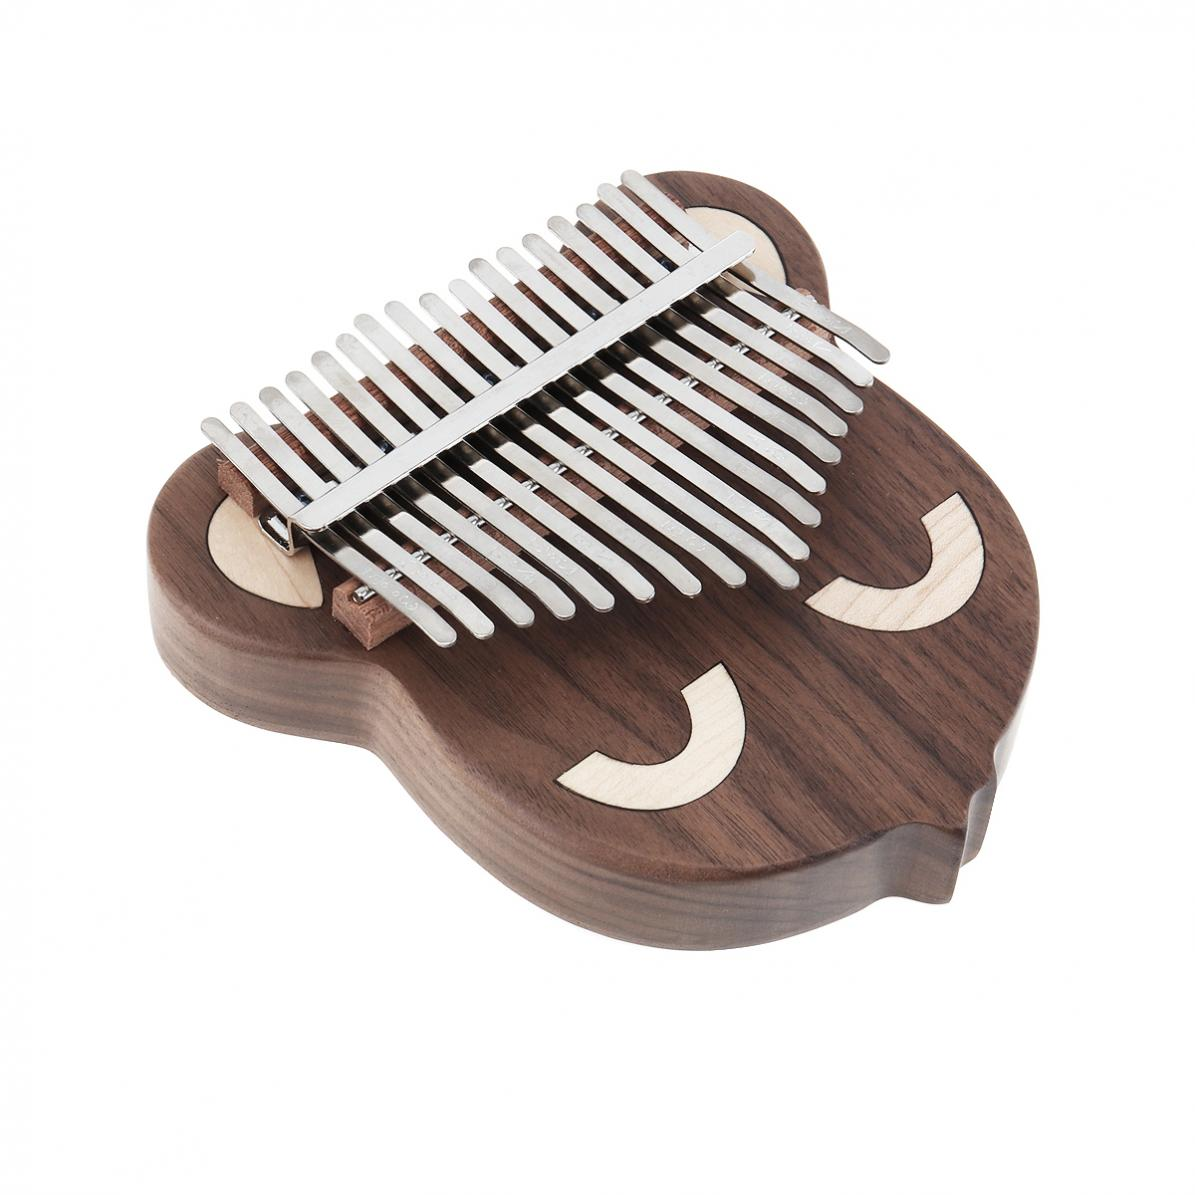 17 Key Thumb Piano Kalimba Hele Single Board Kat/Bear Gezicht Walnoot Mbira Calimba met Tuning Hamer Hout Muzikale instrumenten - 4